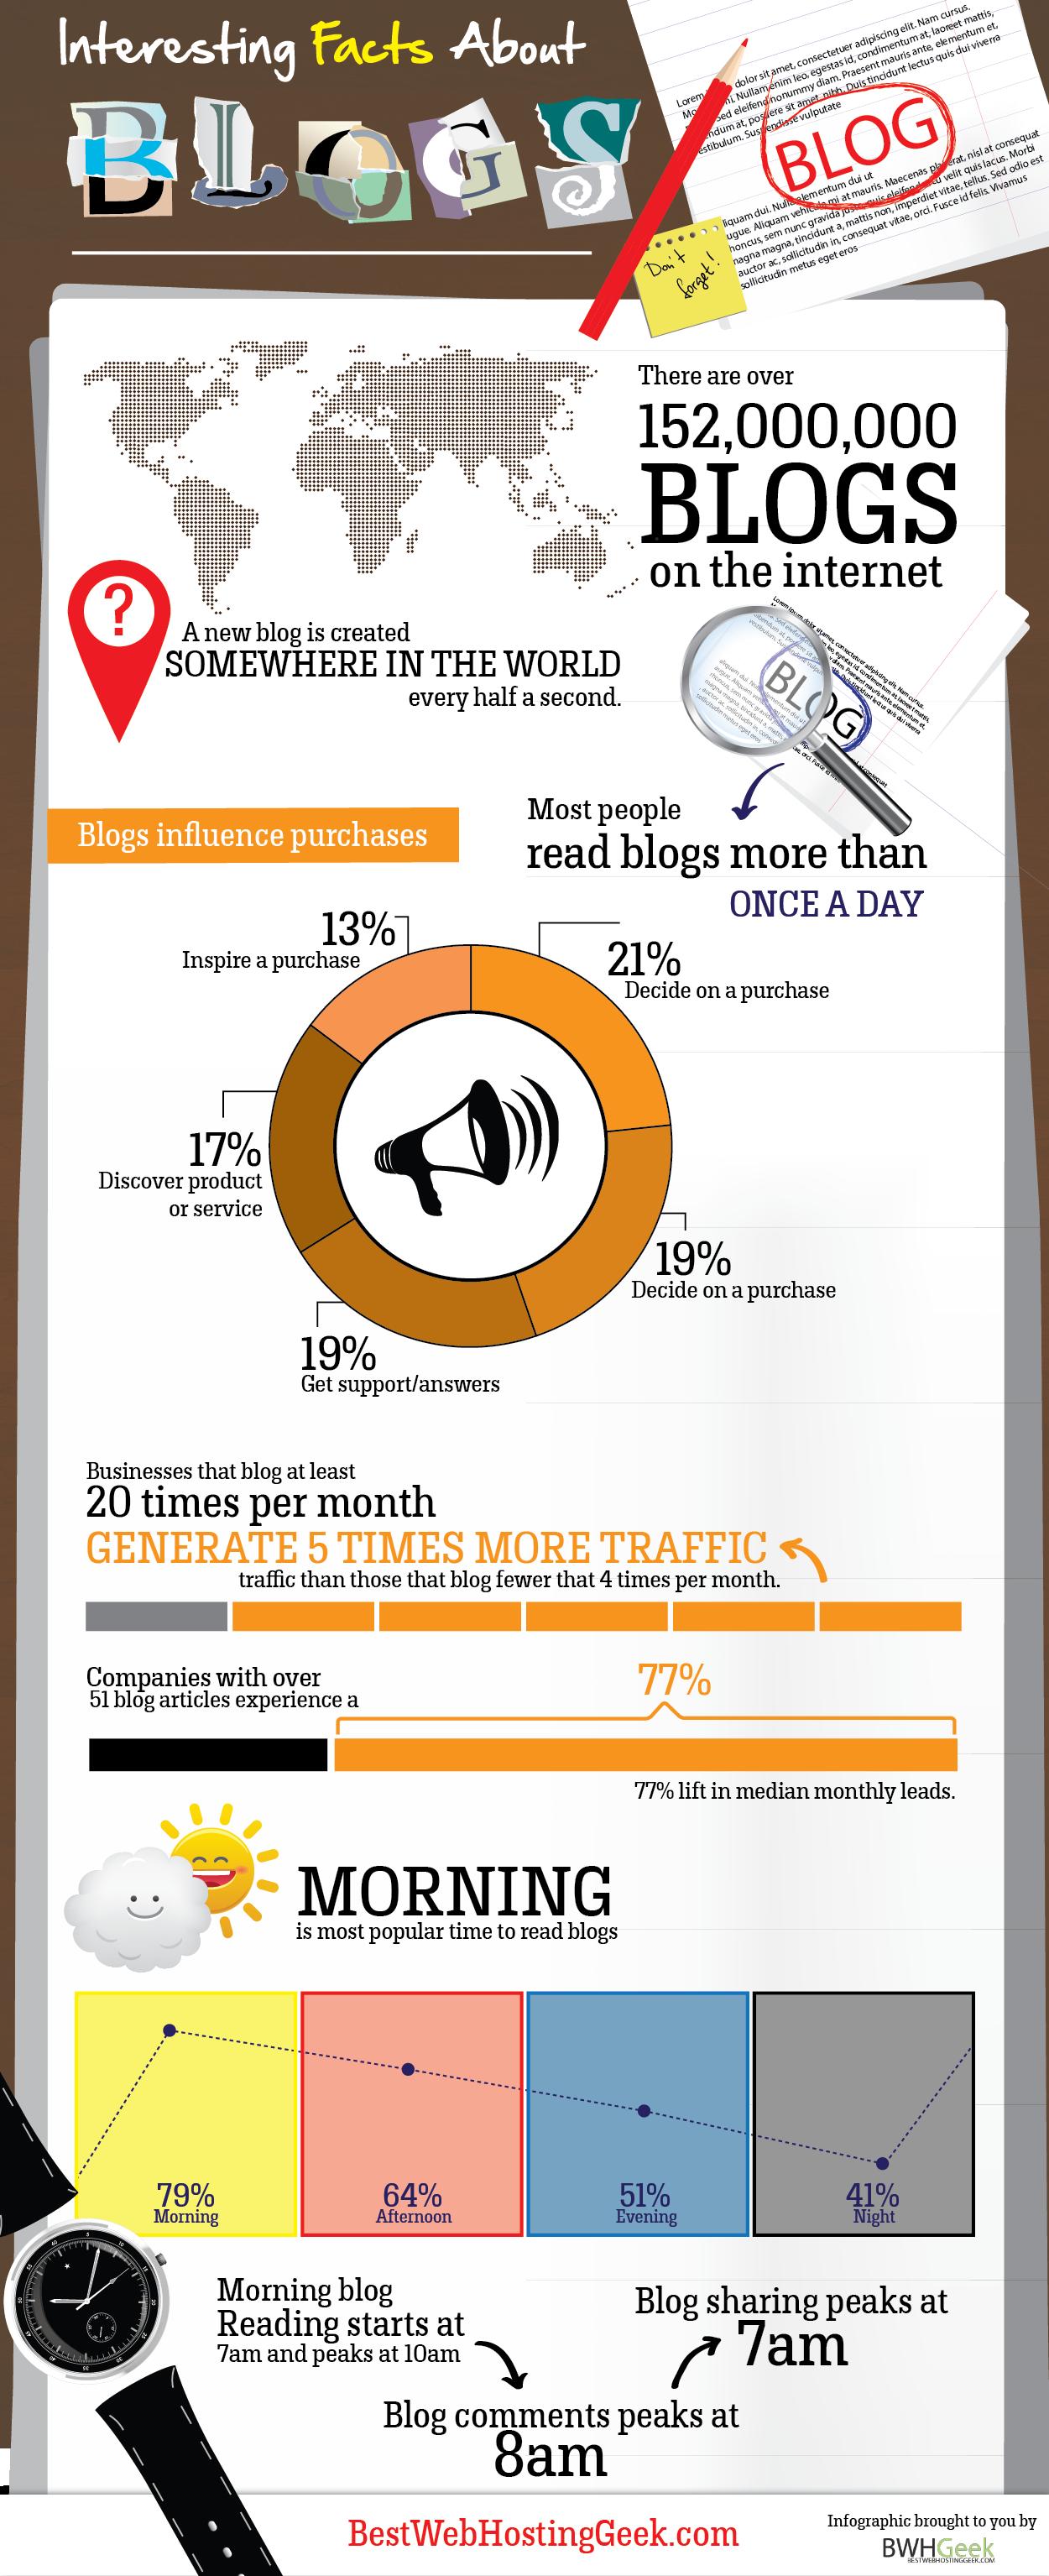 Interesting statistics about Blogging